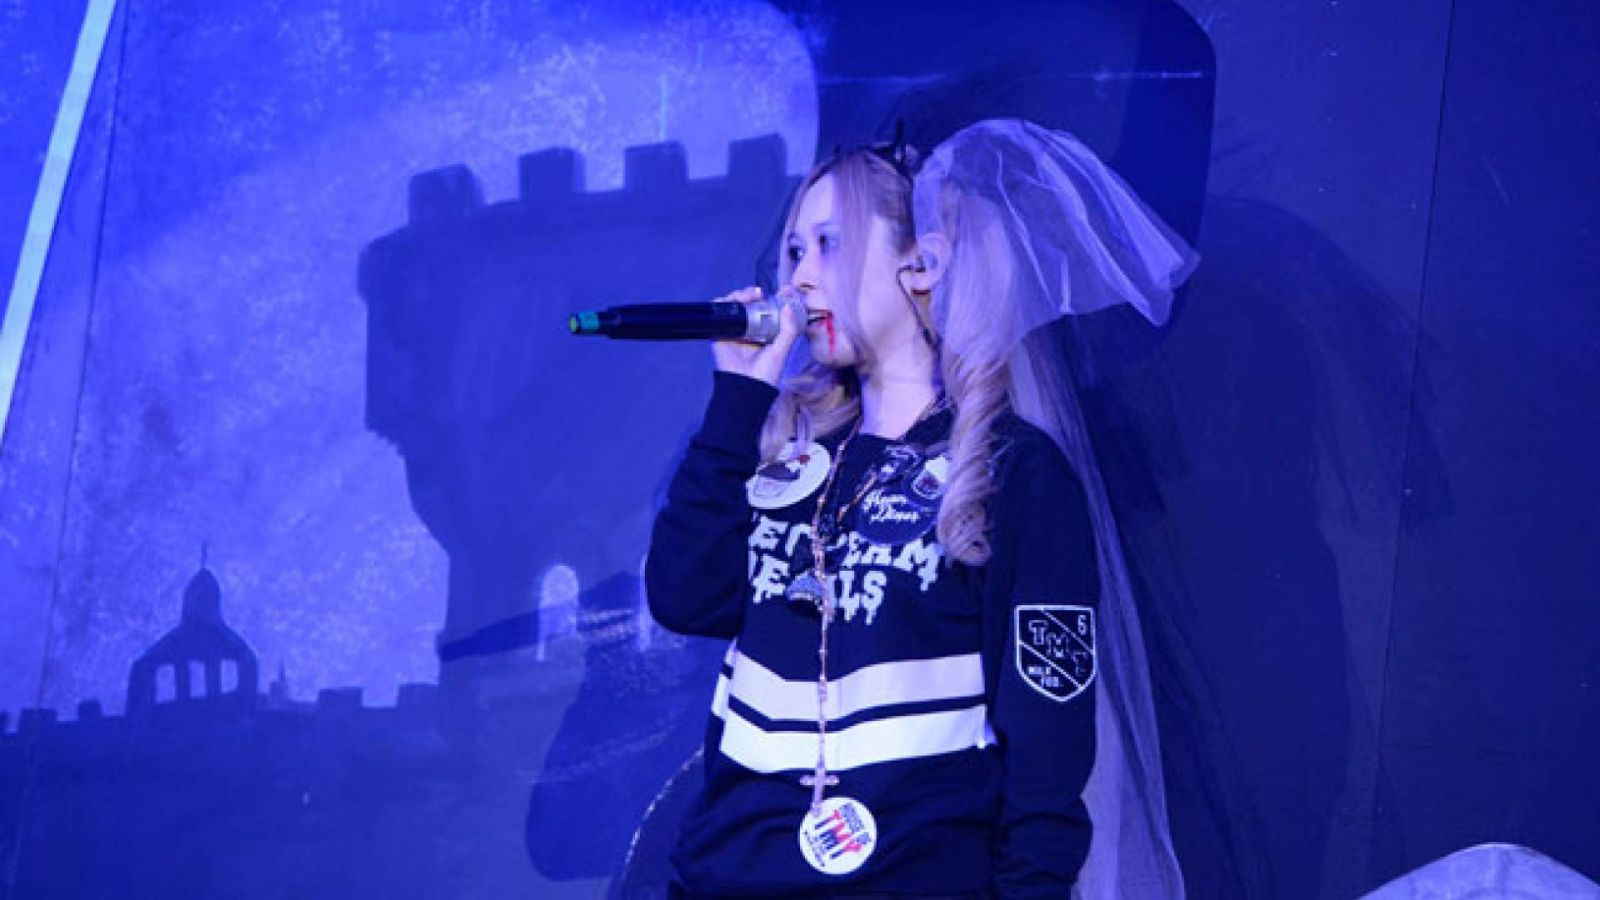 VAMPS Halloween Party 2015 -part 1- © Hideaki Imamoto, Toshikazu Oguruma & Kazuko Tanaka